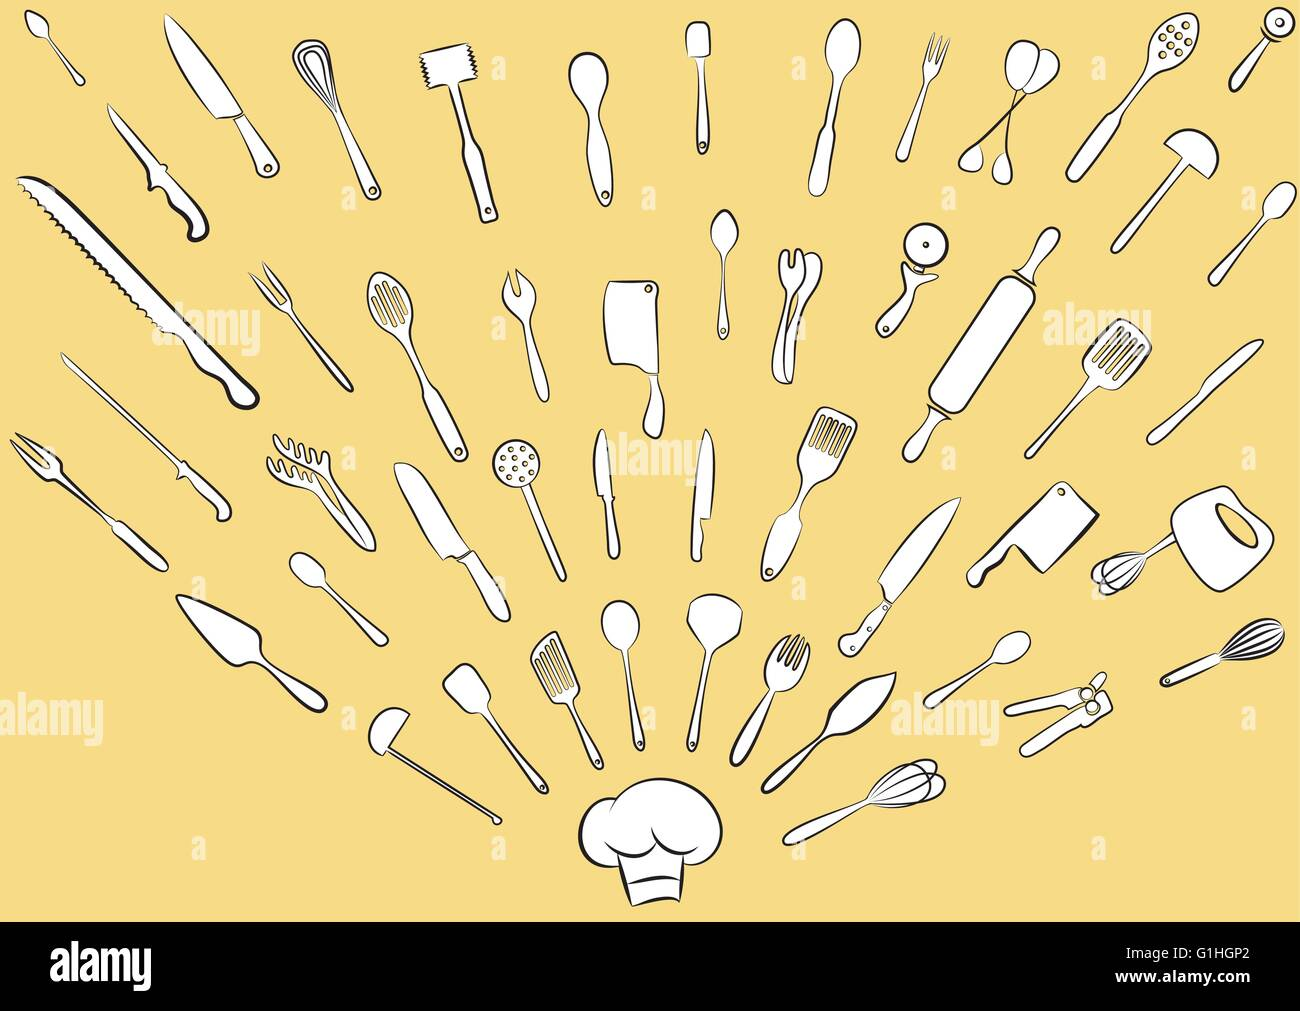 Vector illustration of cooking utensil set in line art mode - Stock Vector